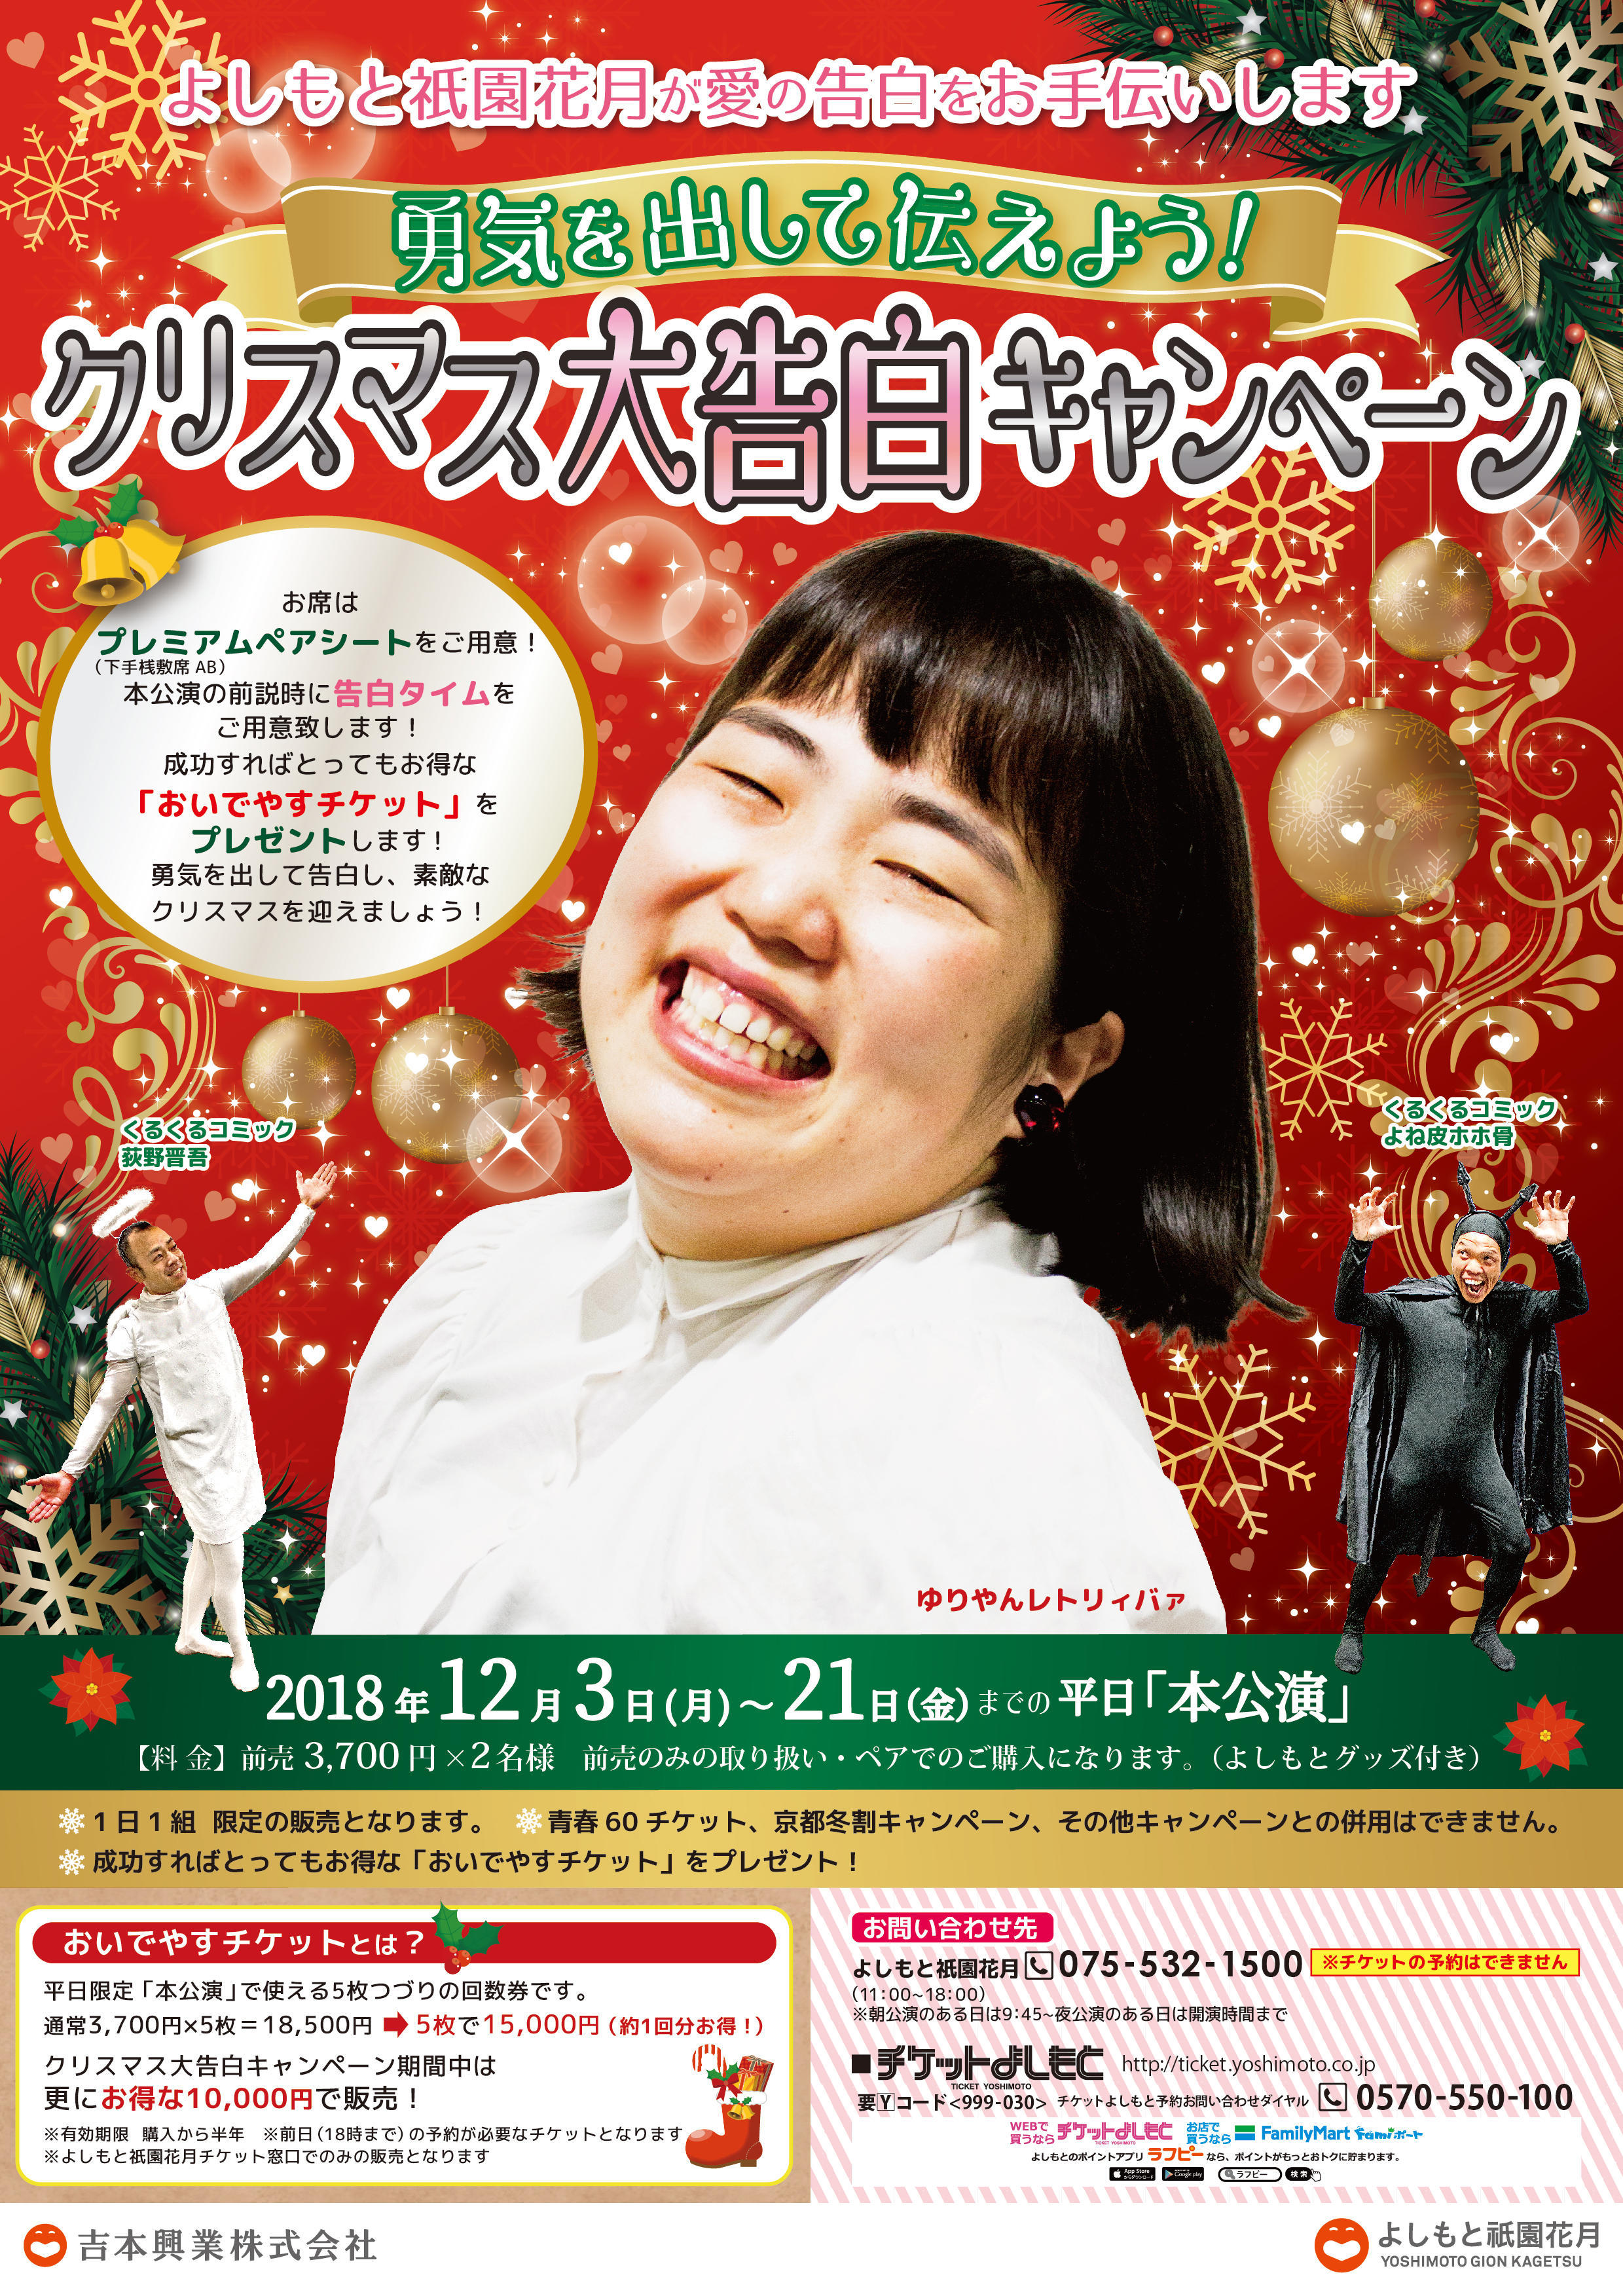 http://news.yoshimoto.co.jp/20181203174423-262382d99cfeba874148200e132409e044772673.jpg